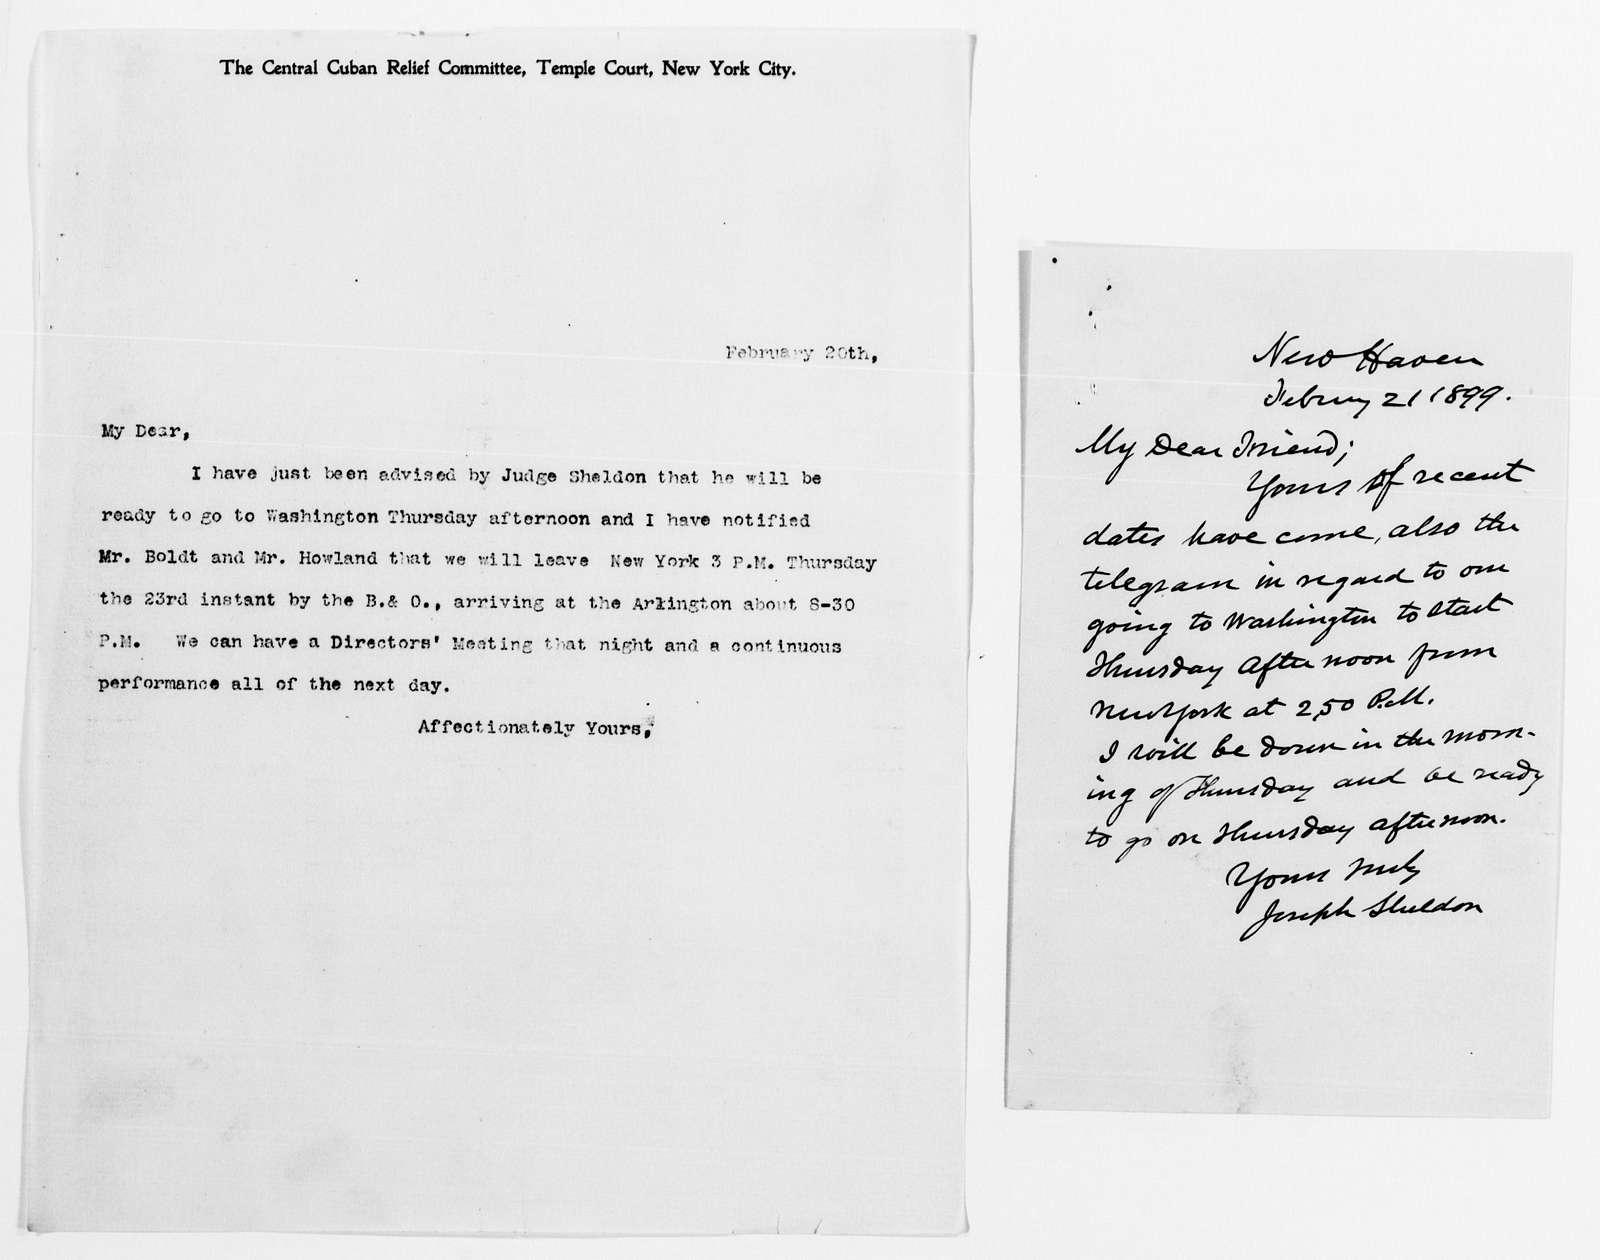 Clara Barton Papers: Red Cross File, 1863-1957; American National Red Cross, 1878-1957; Relief operations; Spanish-American War; Correspondence; General; 1899, Jan.-Feb.